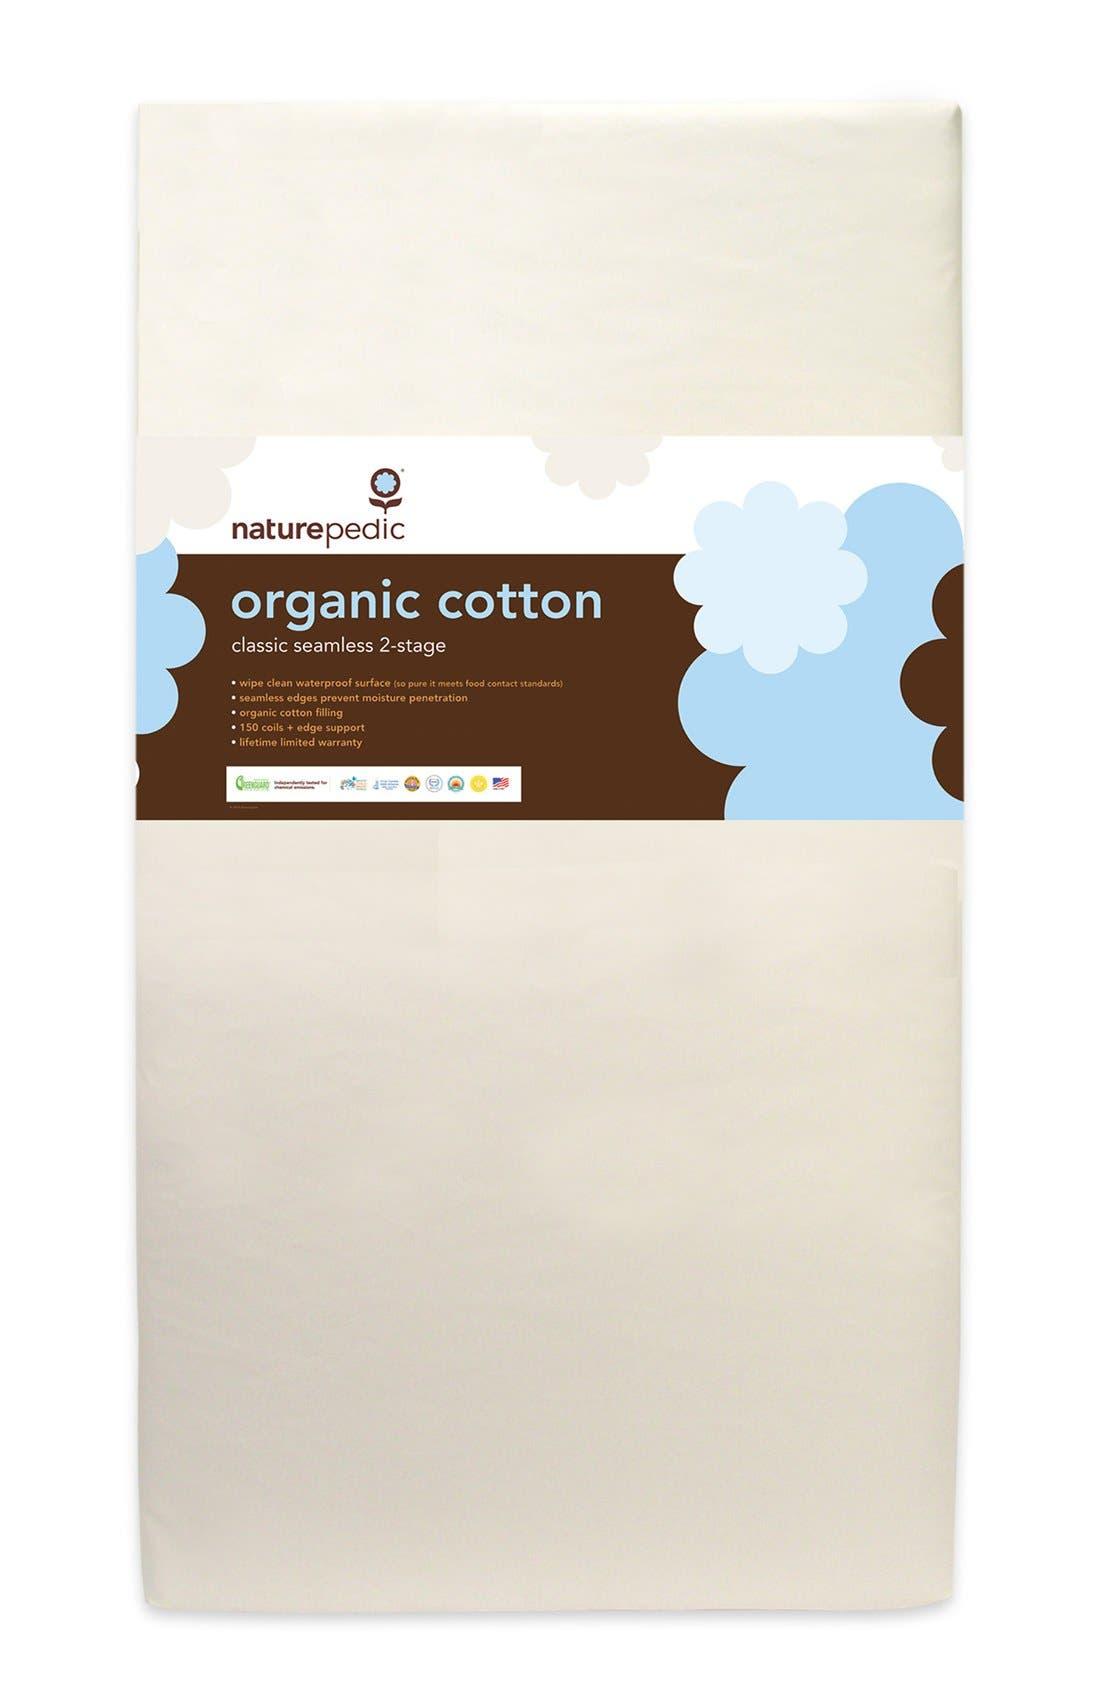 Infant Naturepedic Lightweight Organic Cotton Classic 2Stage Crib Mattress Size One Size  White